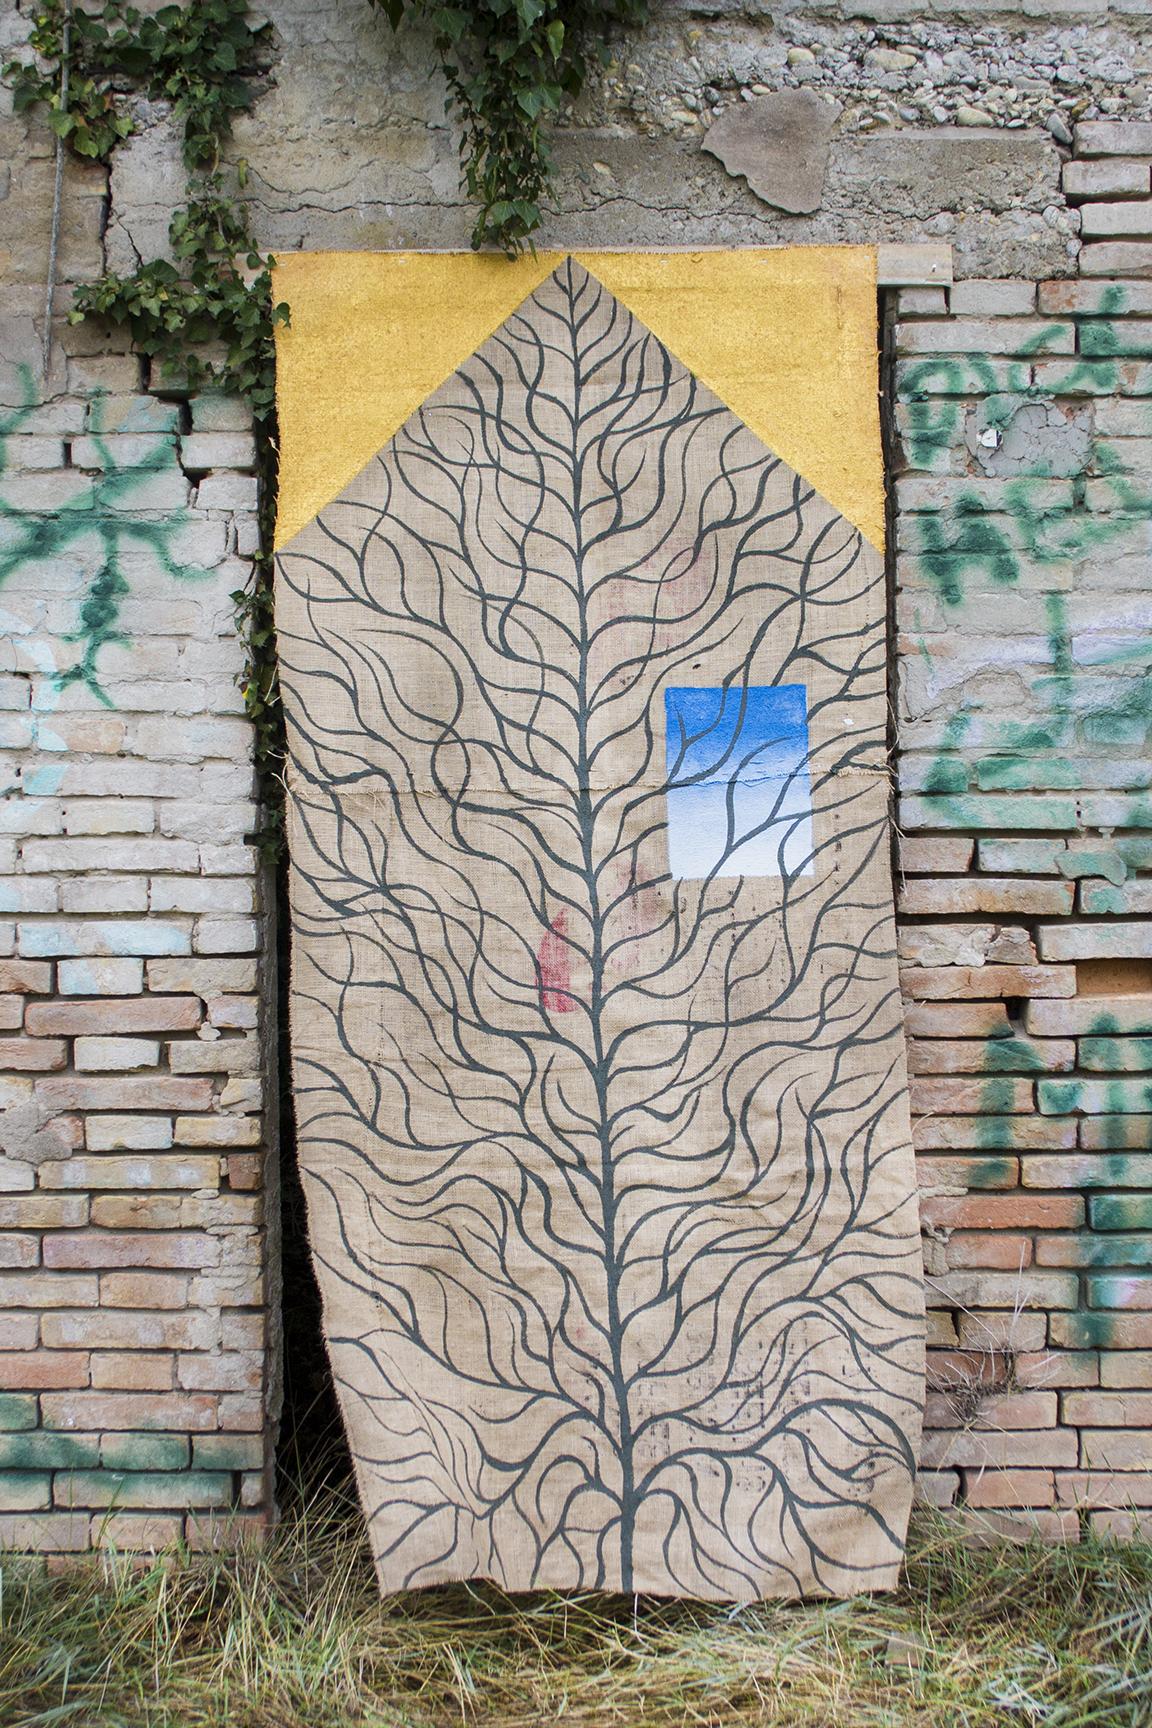 ABITARE Gola Hundun Street Art